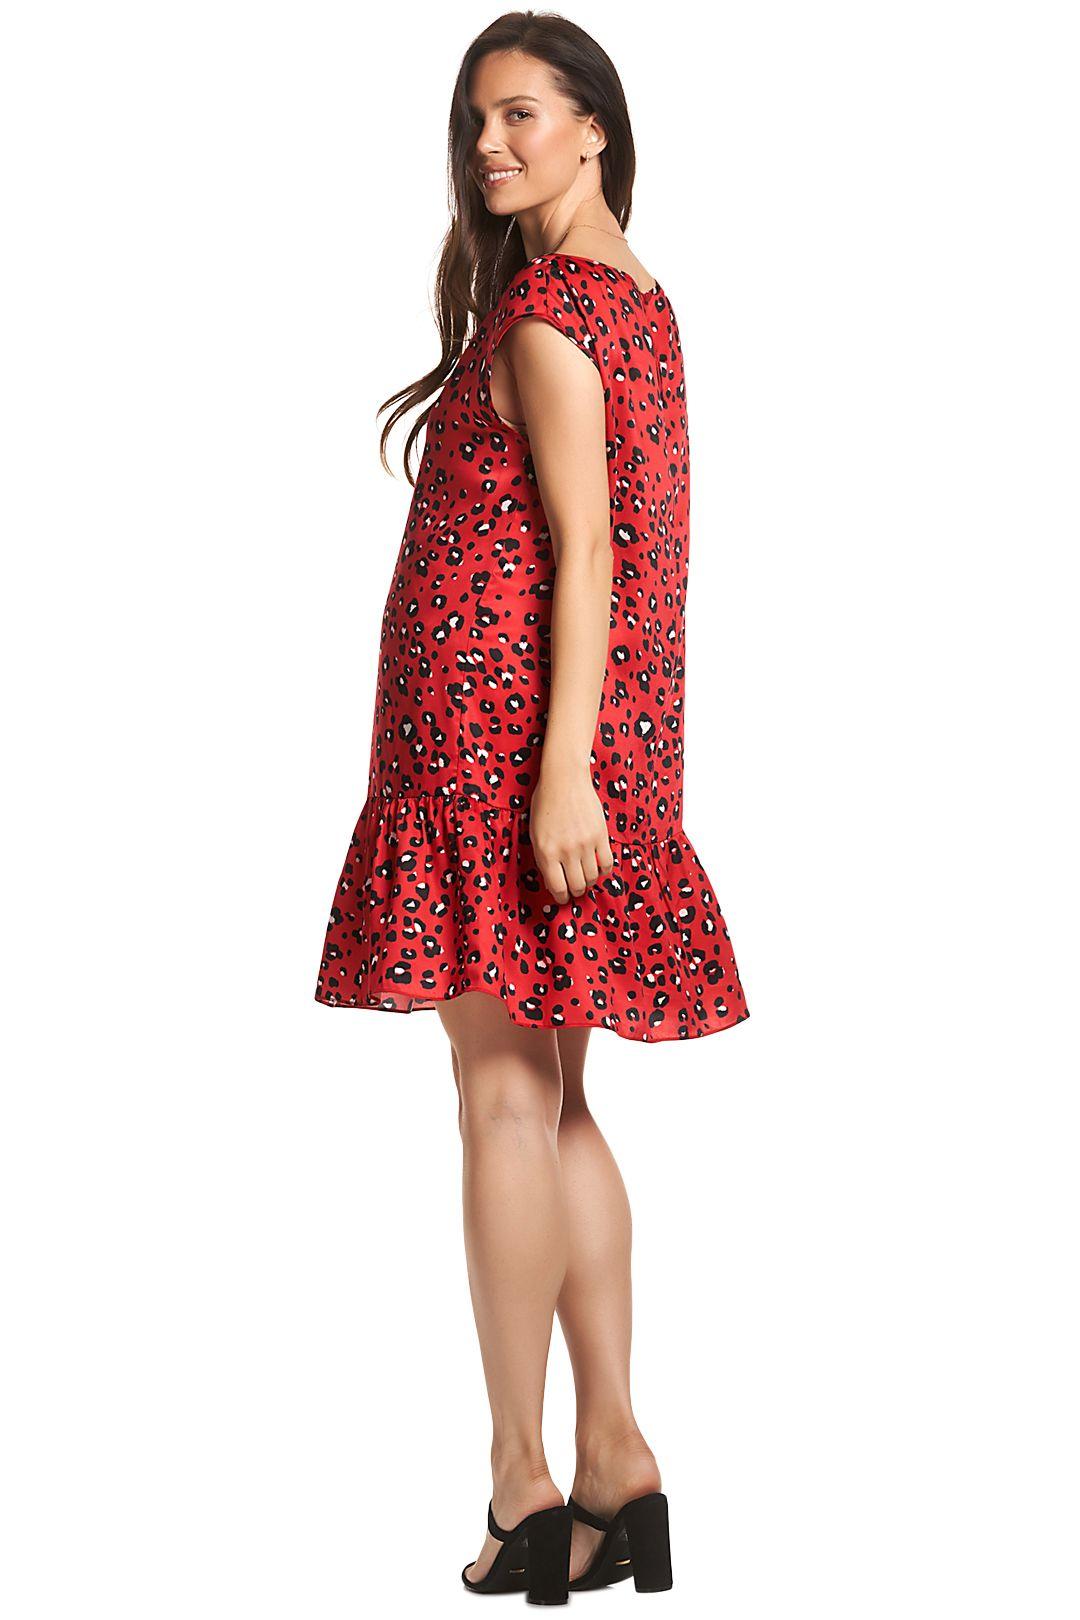 Soon-Maternity-Sydney-Dress-Red-Leopard-Back